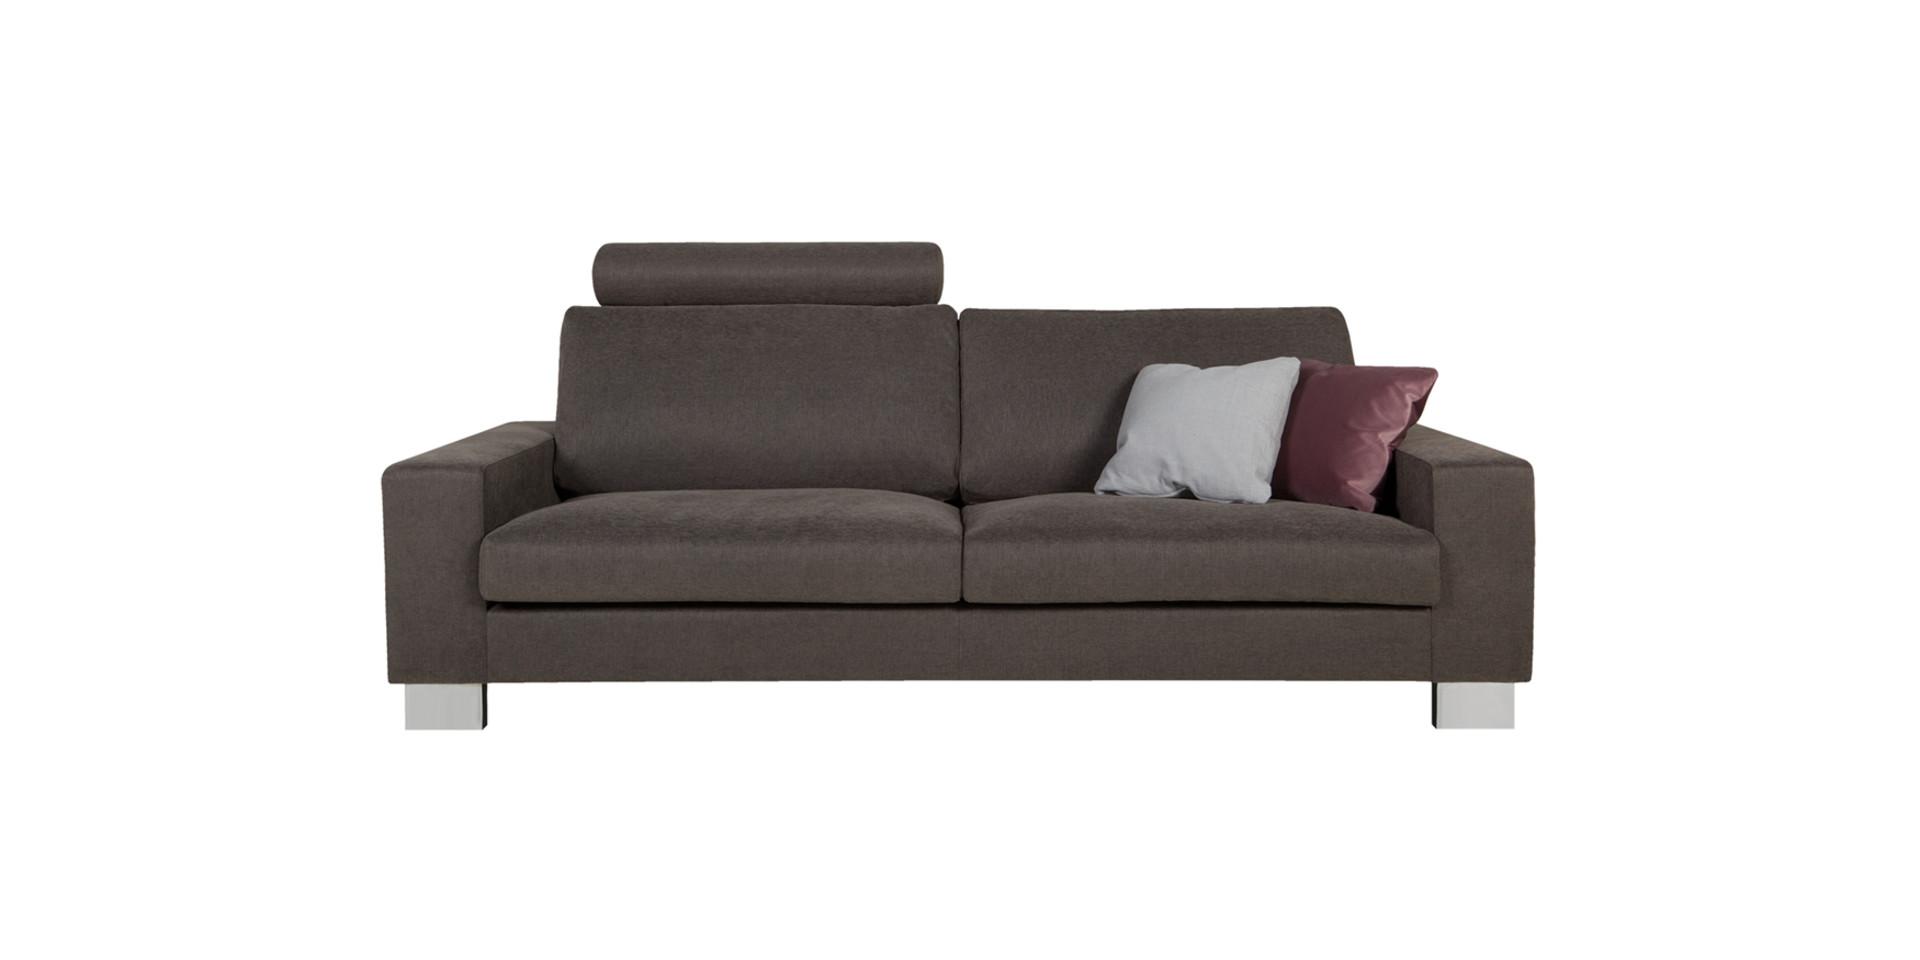 sits-quattro-canape-3seater90_drom54_grey_4